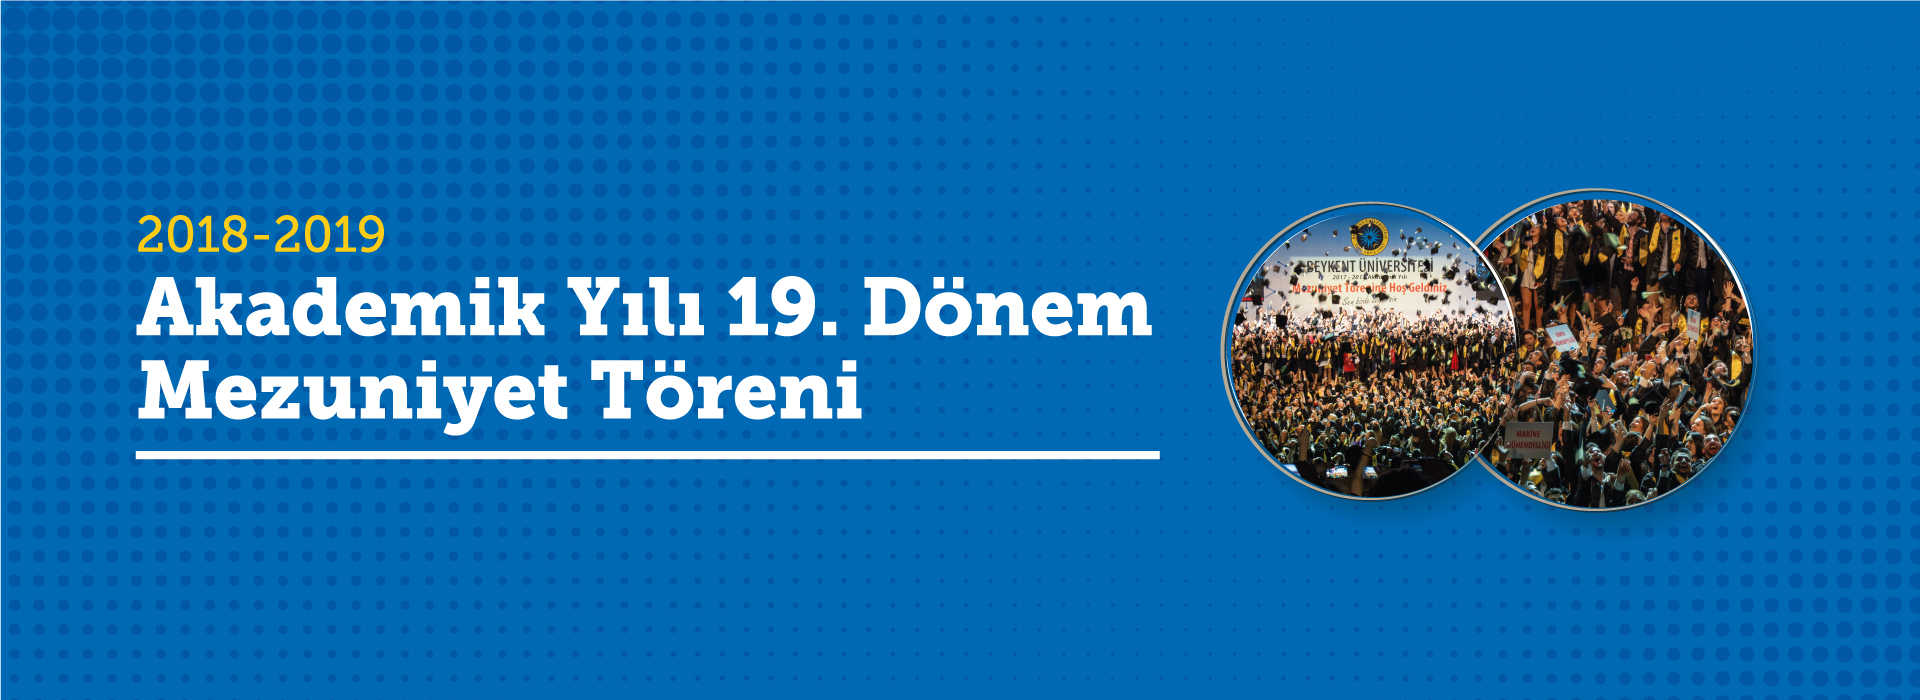 2018-2019-Mezuniyet-Toreni-1920x700